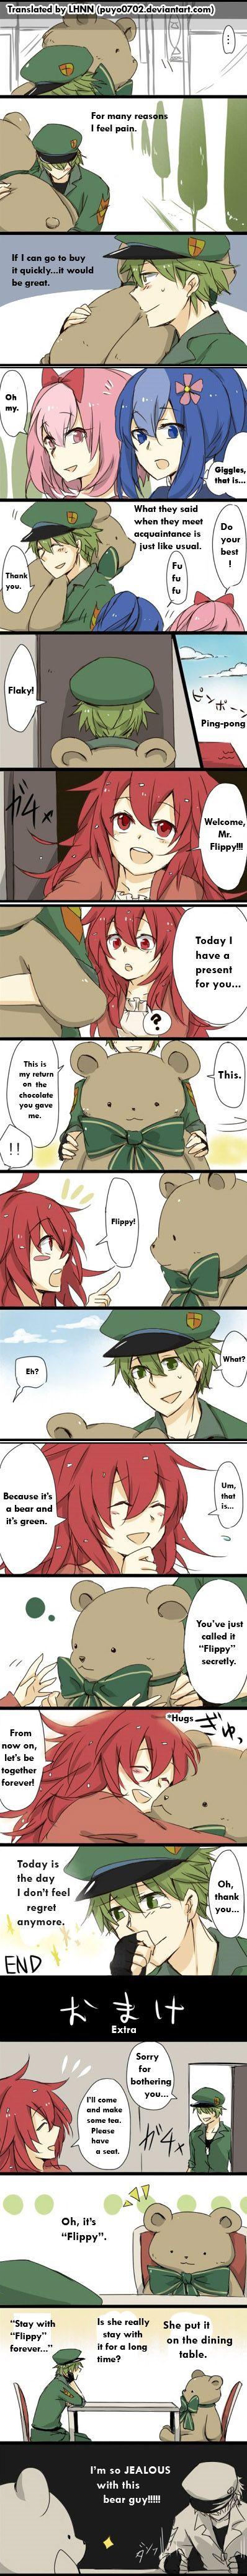 HTF: Flippy x Flaky...Teddy Bear